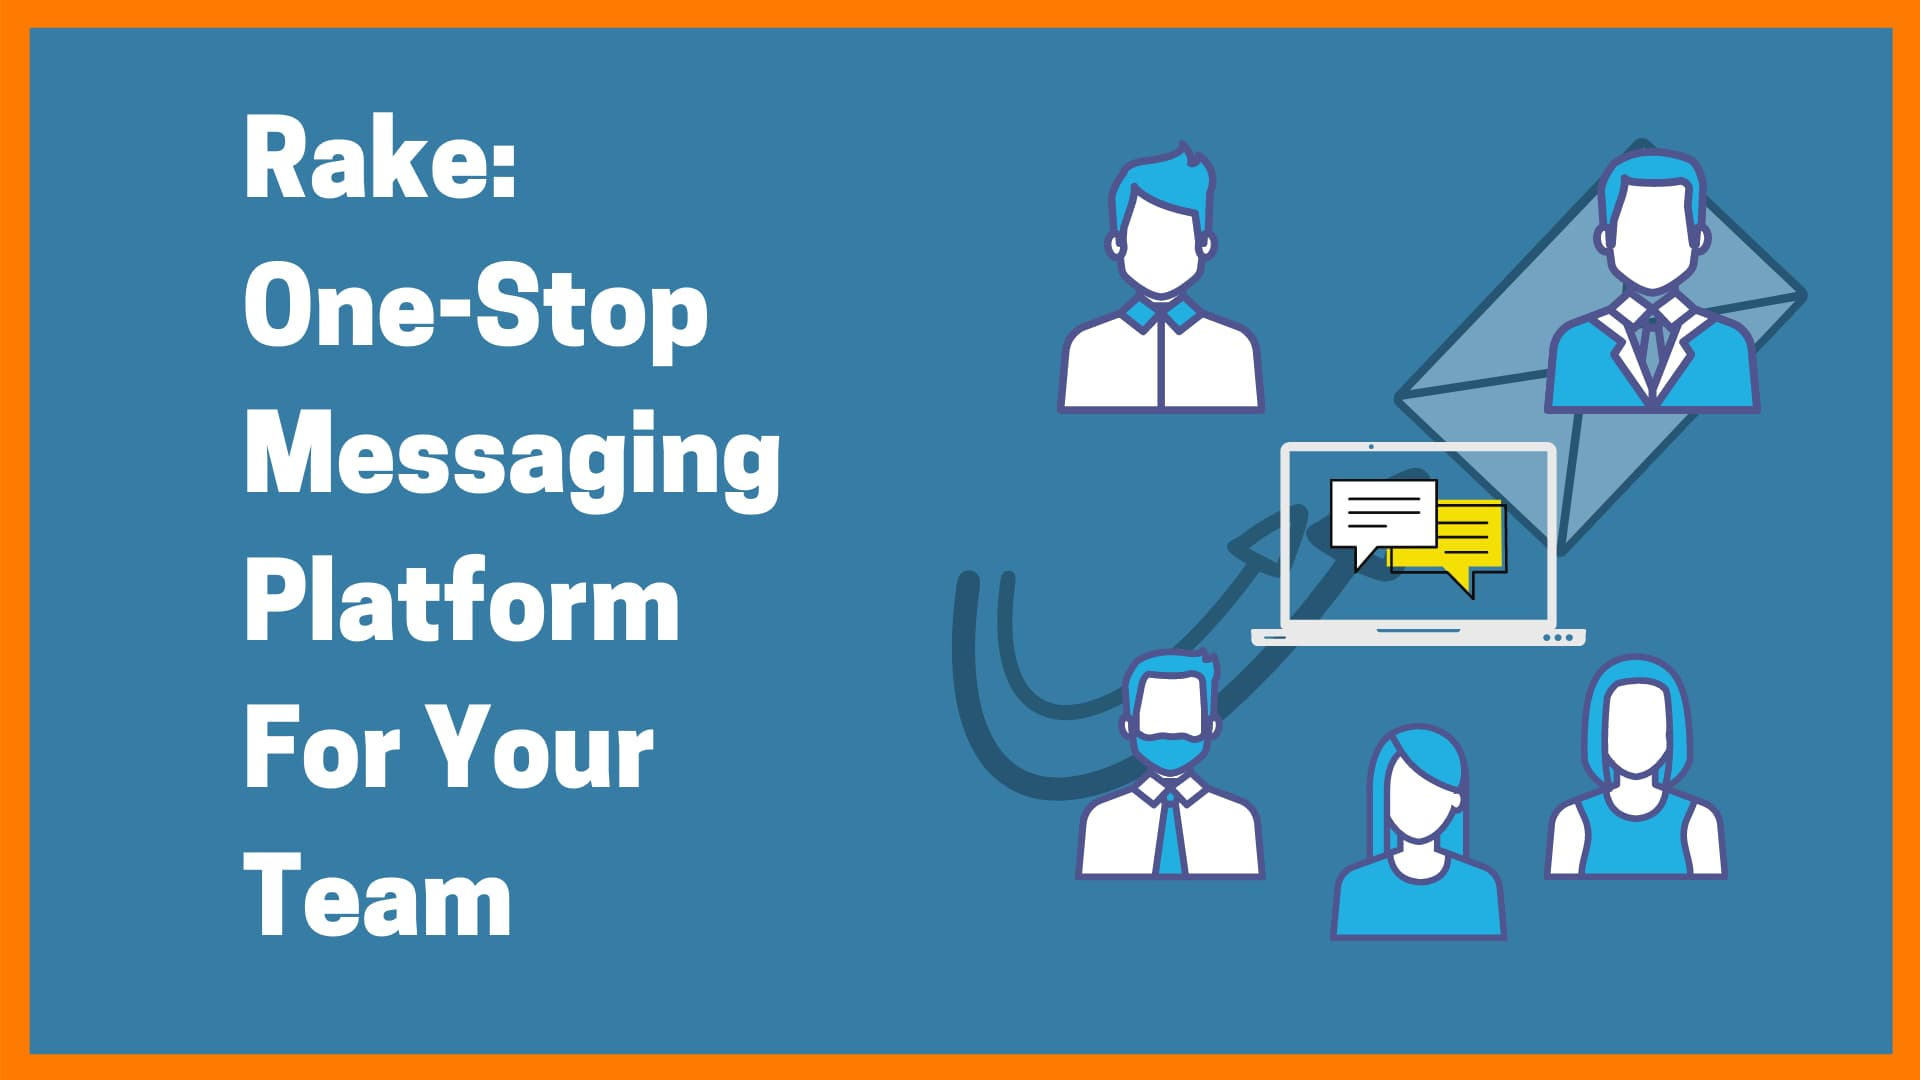 Rake: One-Stop Messaging Platform For Your Team